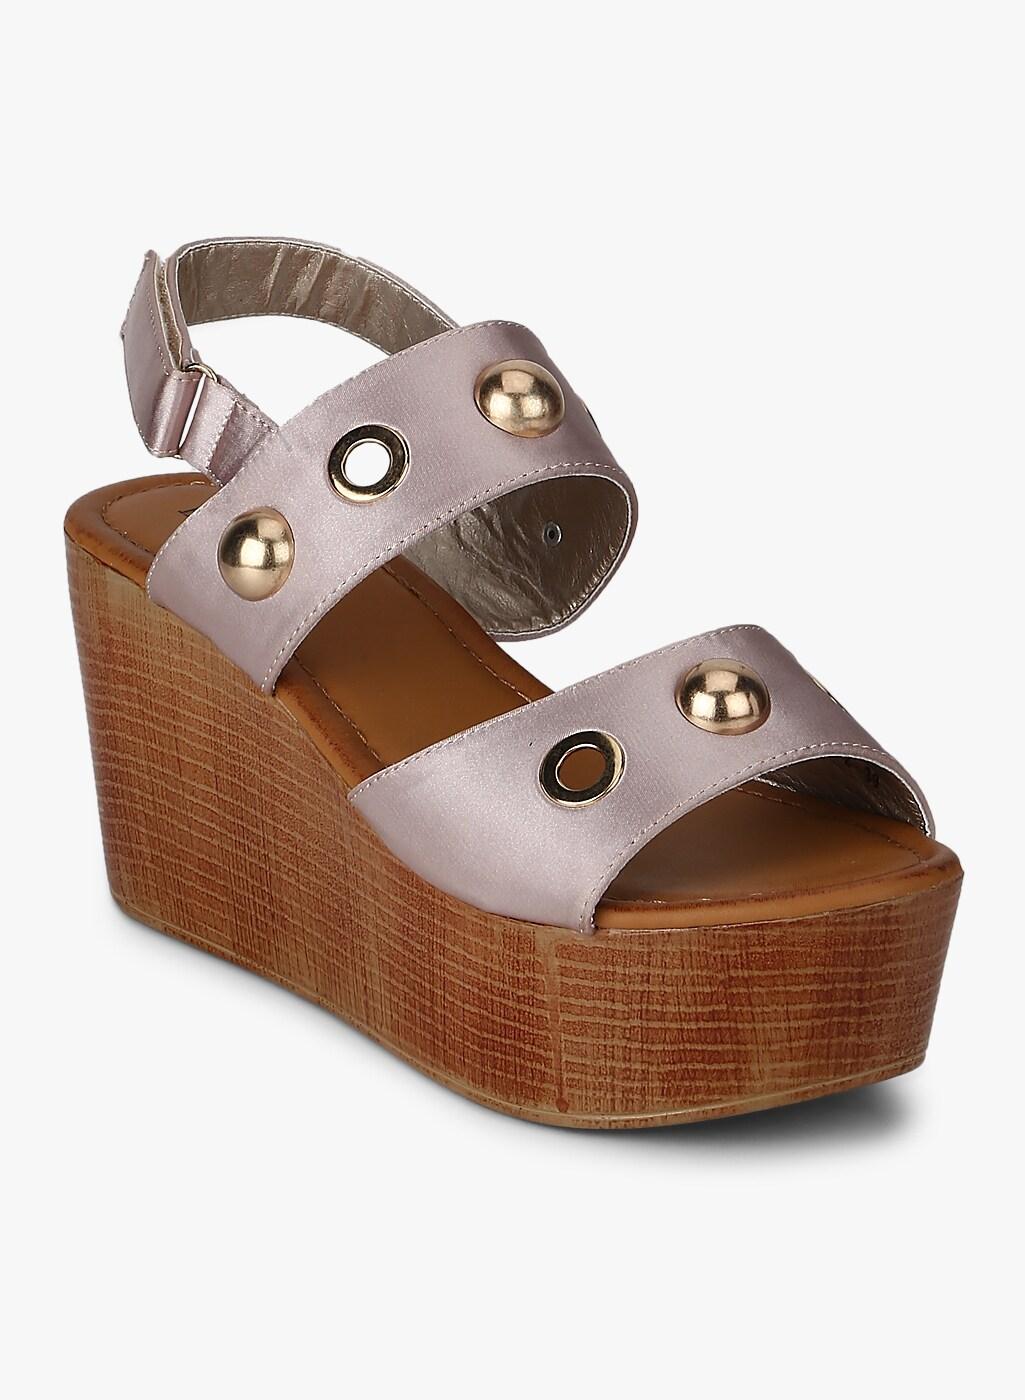 0271ce2a53ac Purple Women Casual Shoes Heels - Buy Purple Women Casual Shoes Heels  online in India